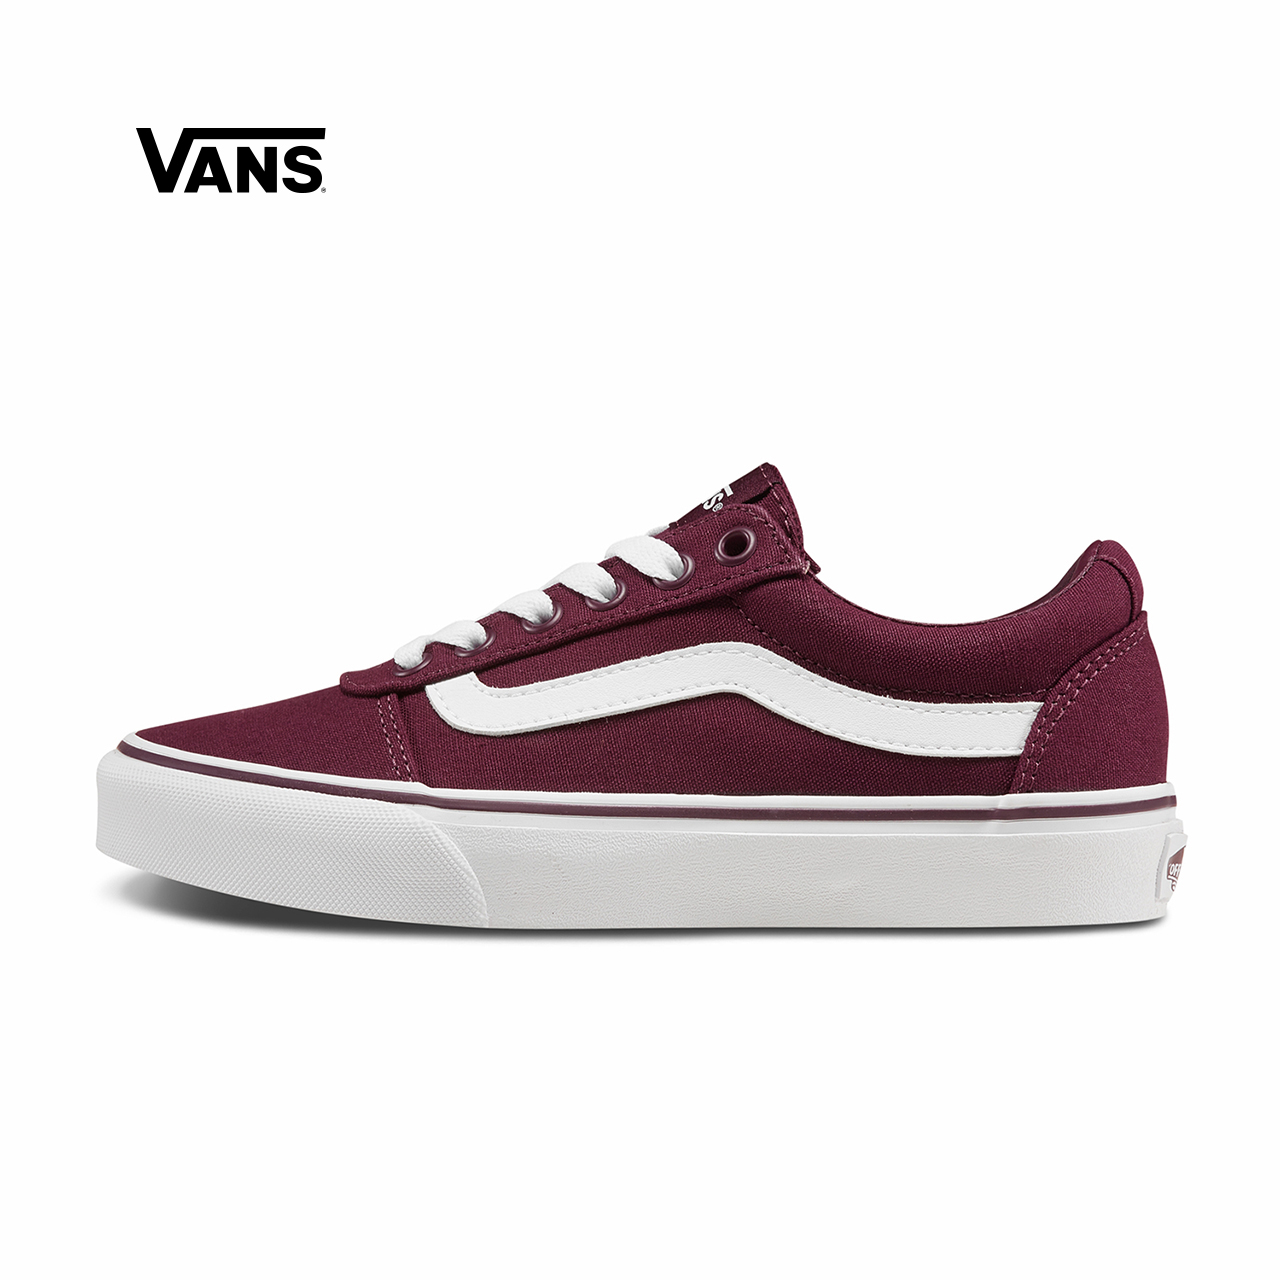 Vans范斯 运动休闲系列 帆布鞋 低帮新款女子侧边条纹官方正品